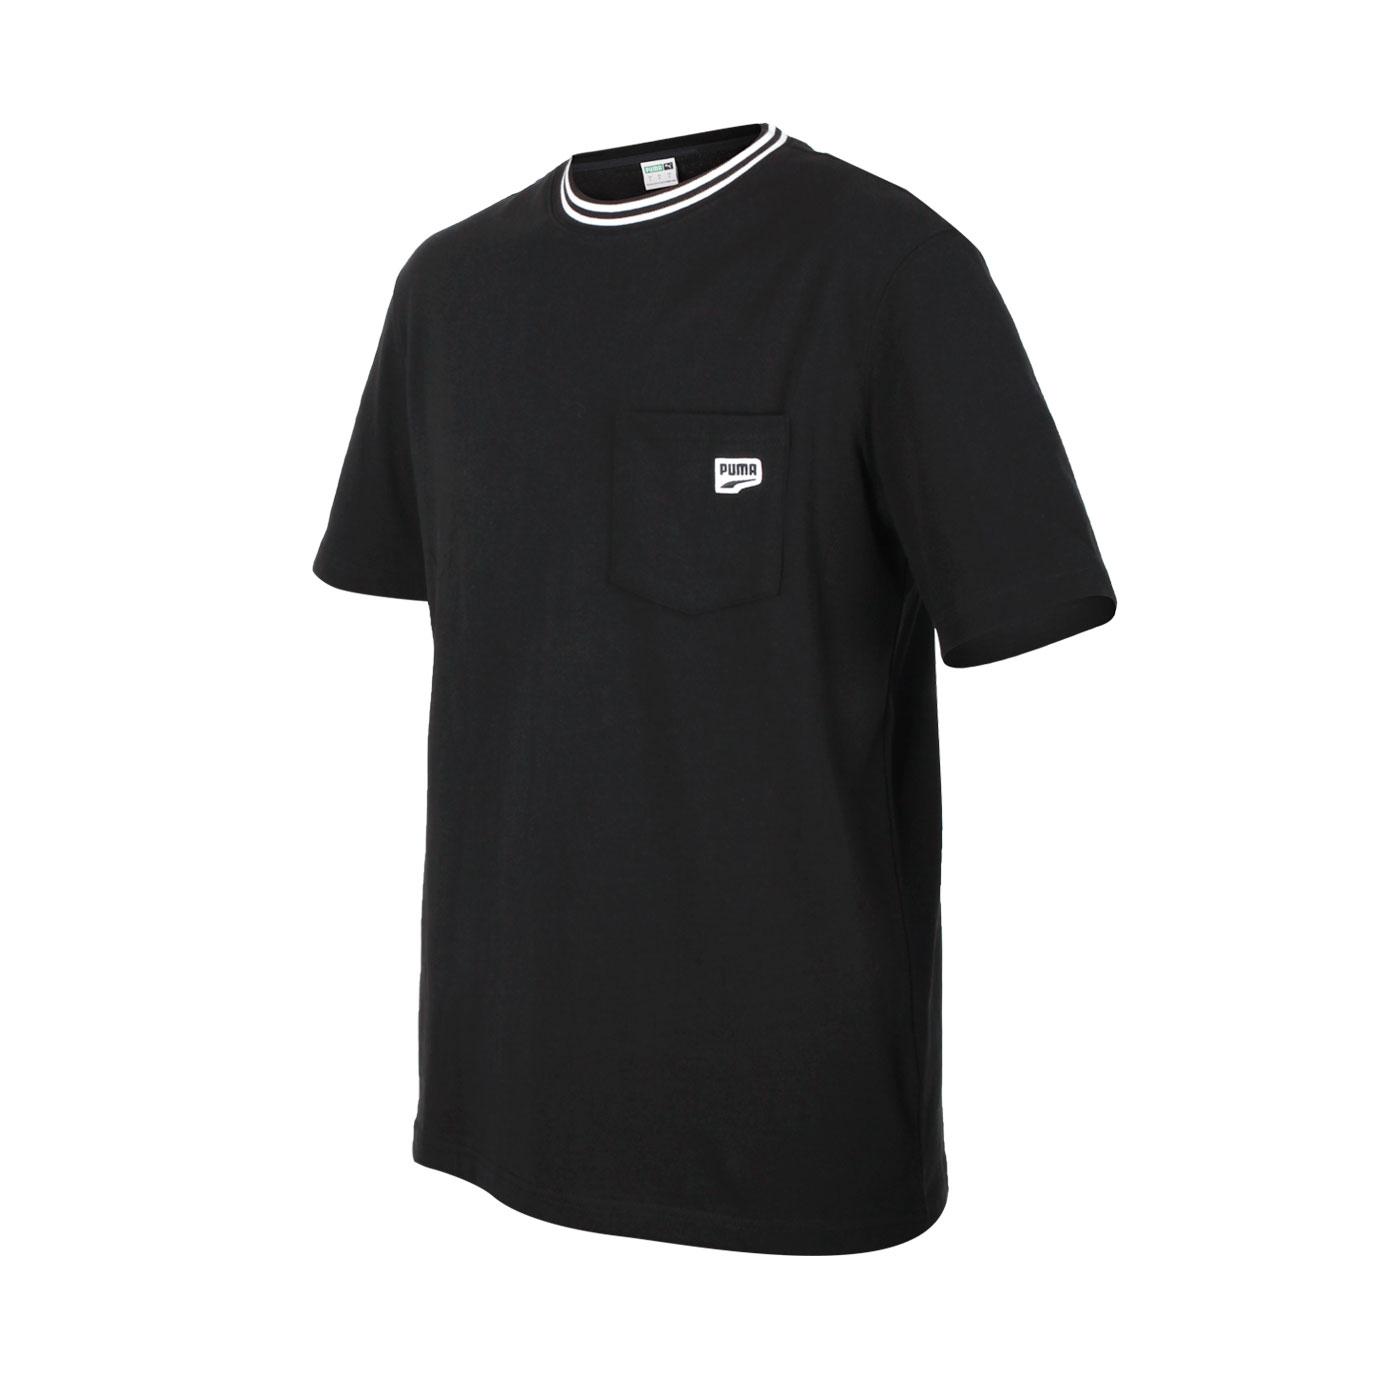 PUMA 男款Down town口袋短袖T恤 53143201